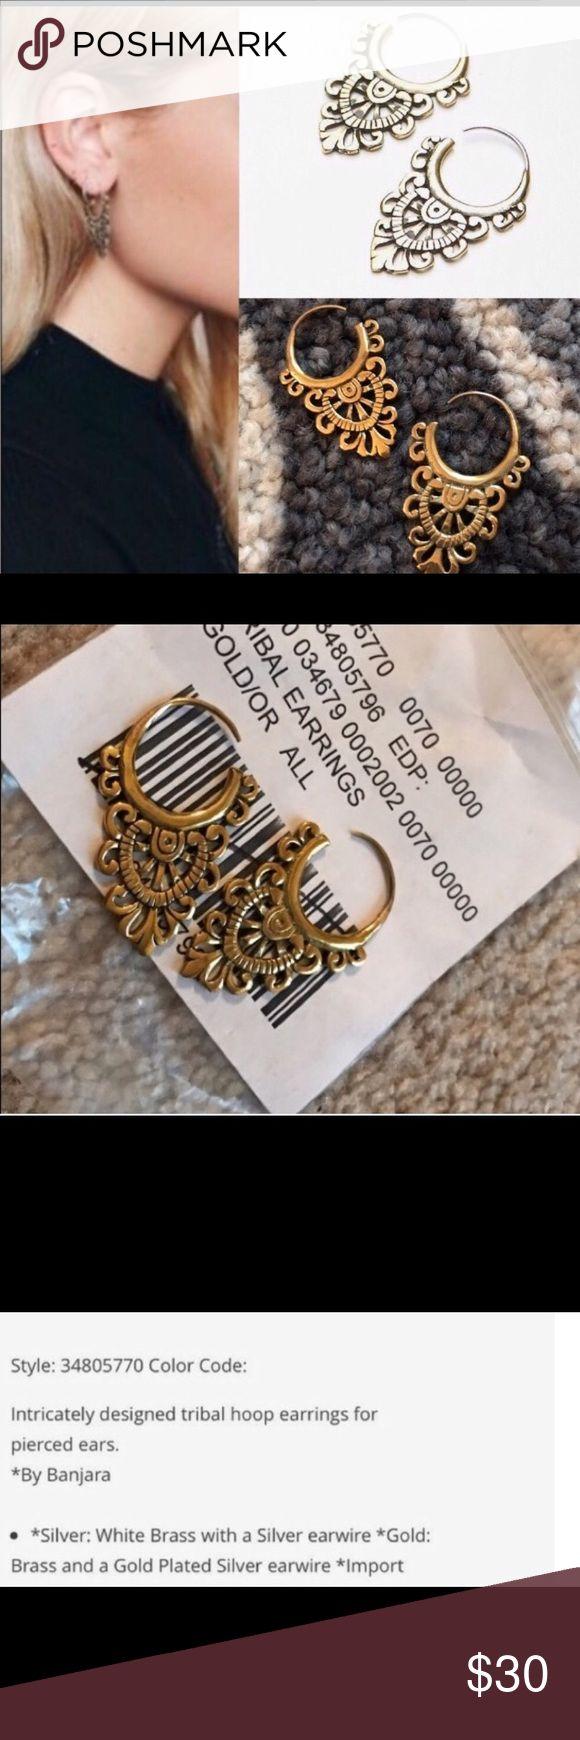 New Free People Banjara  tribal earrings gold tone Free People beautiful Banjara tribal earrings . Gold color .sold out Free People Jewelry Earrings